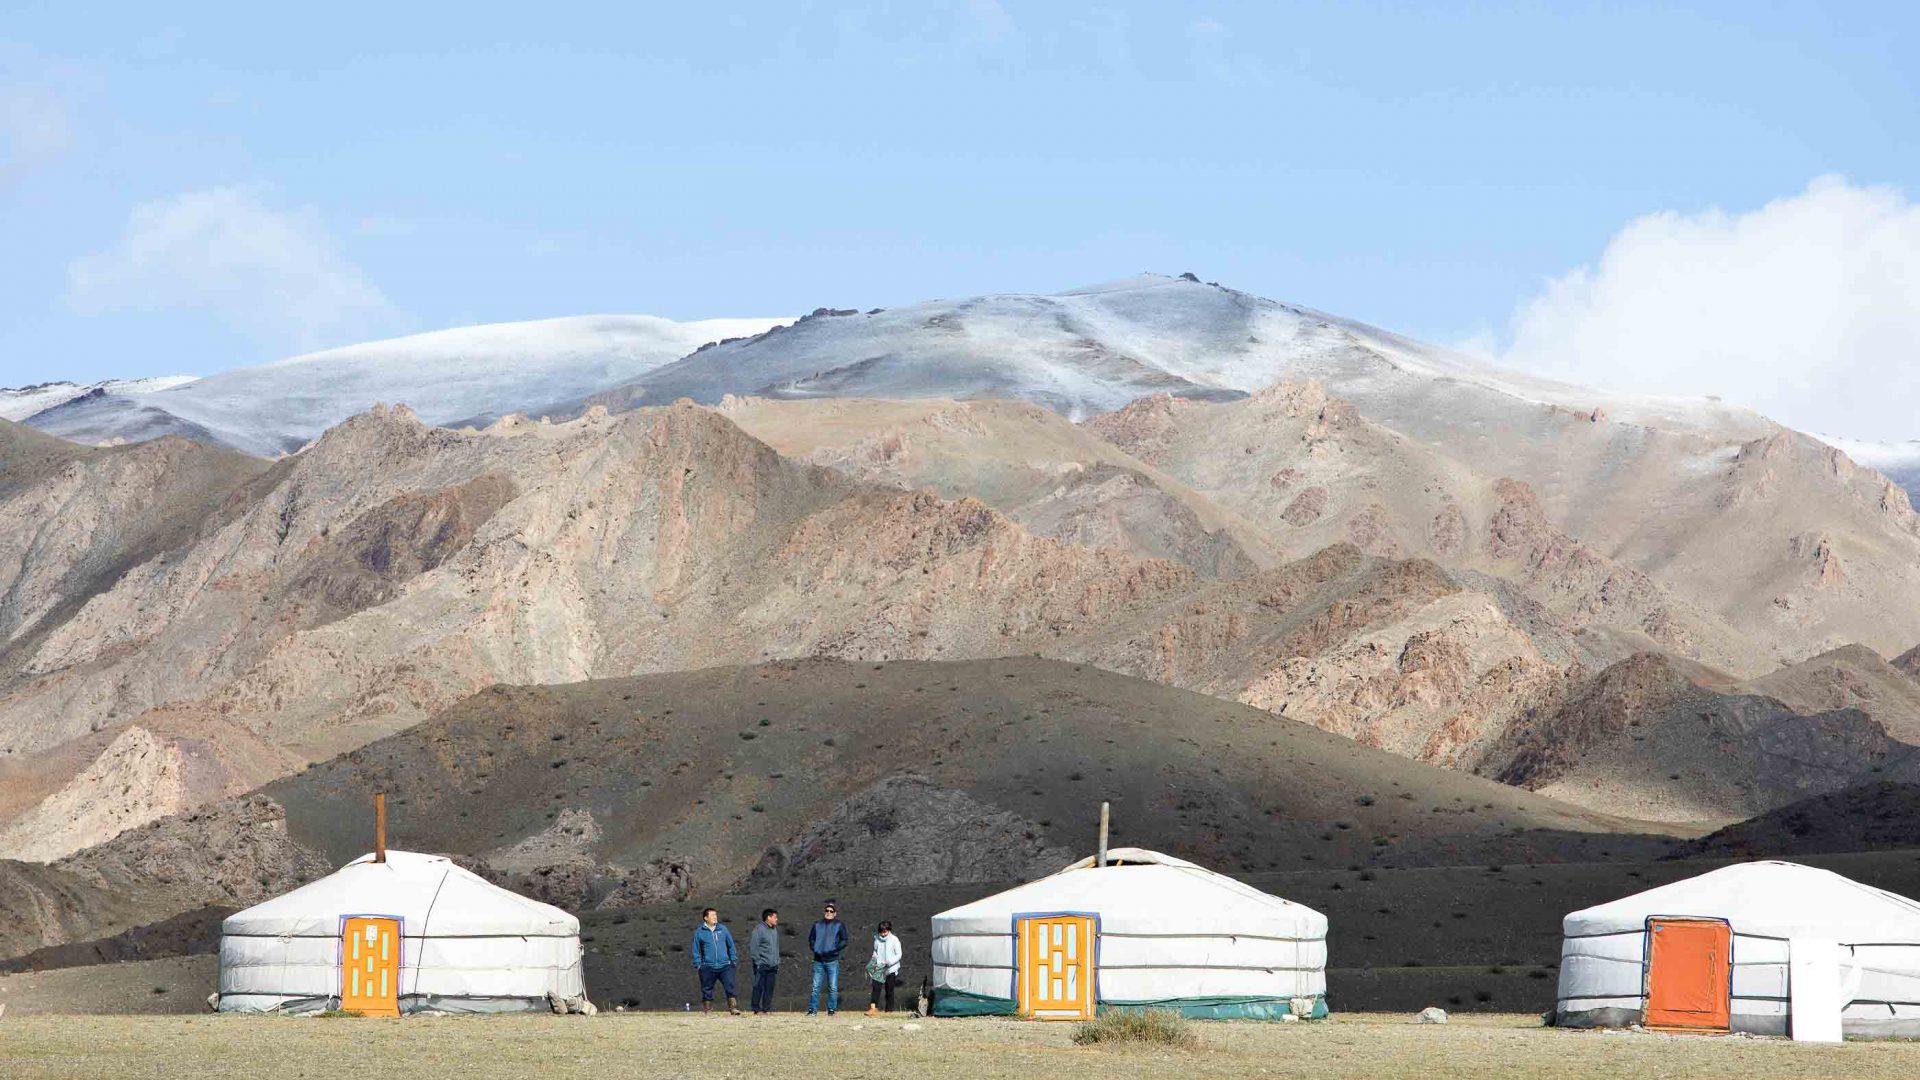 Yurt shaped structures in a barren landscape.